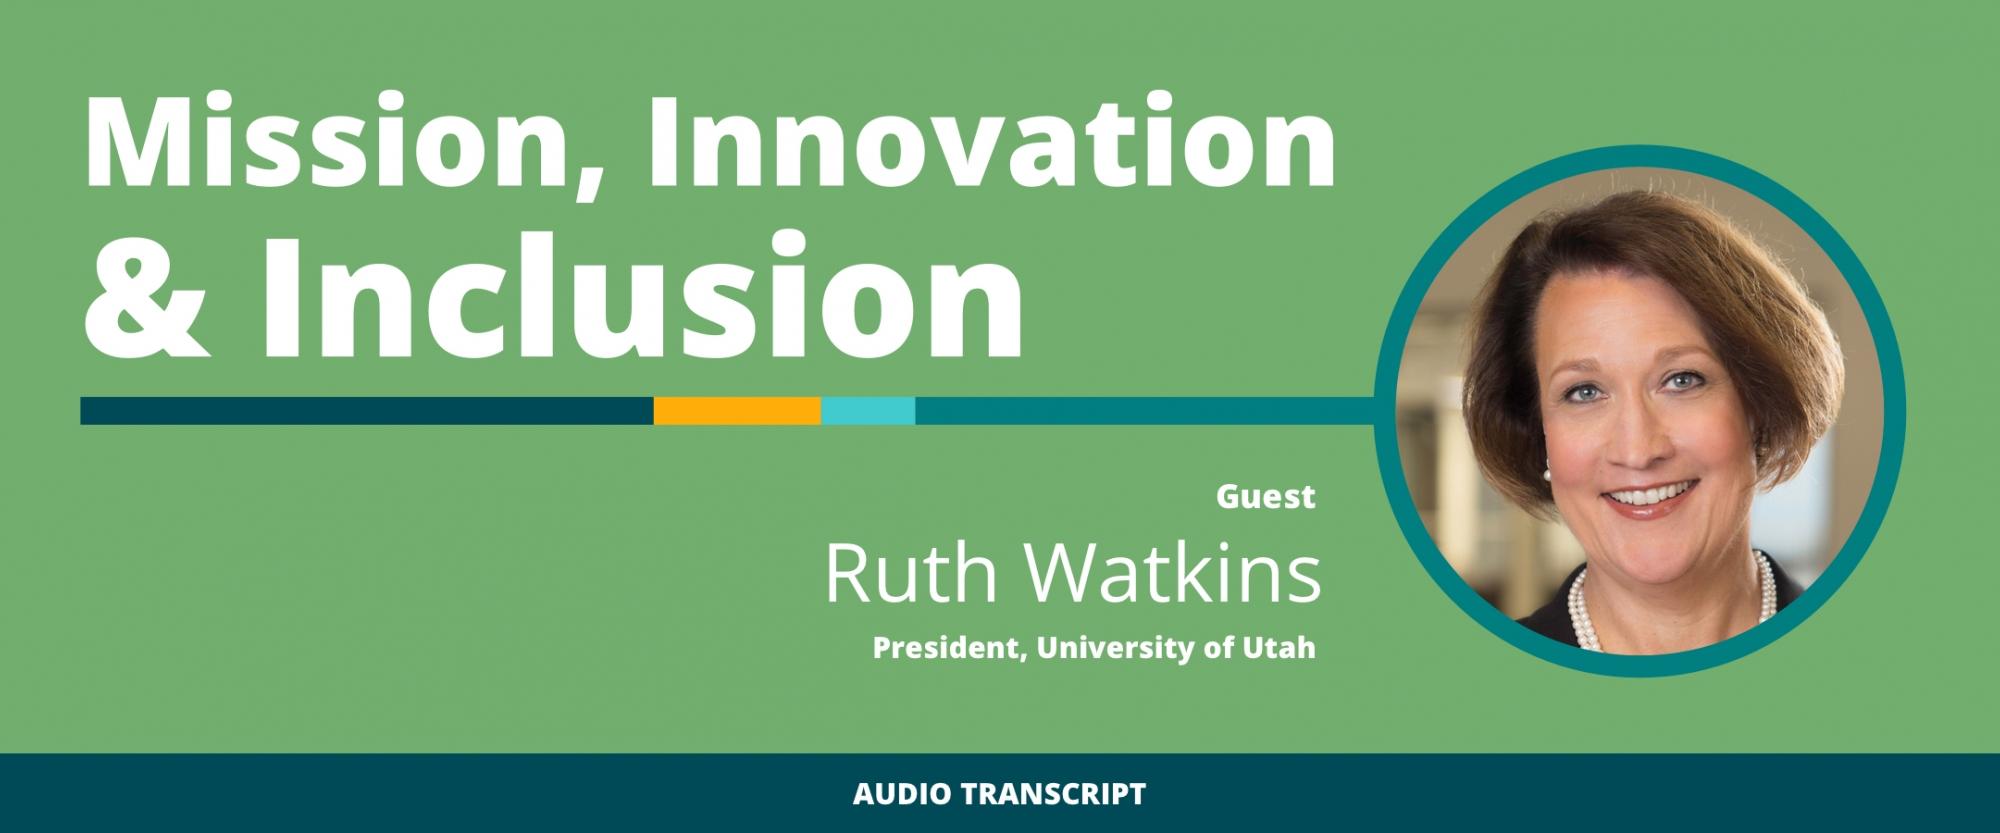 Weekly Wisdom Episode 8: Transcript of Conversation With Ruth Watkins, University of Utah President